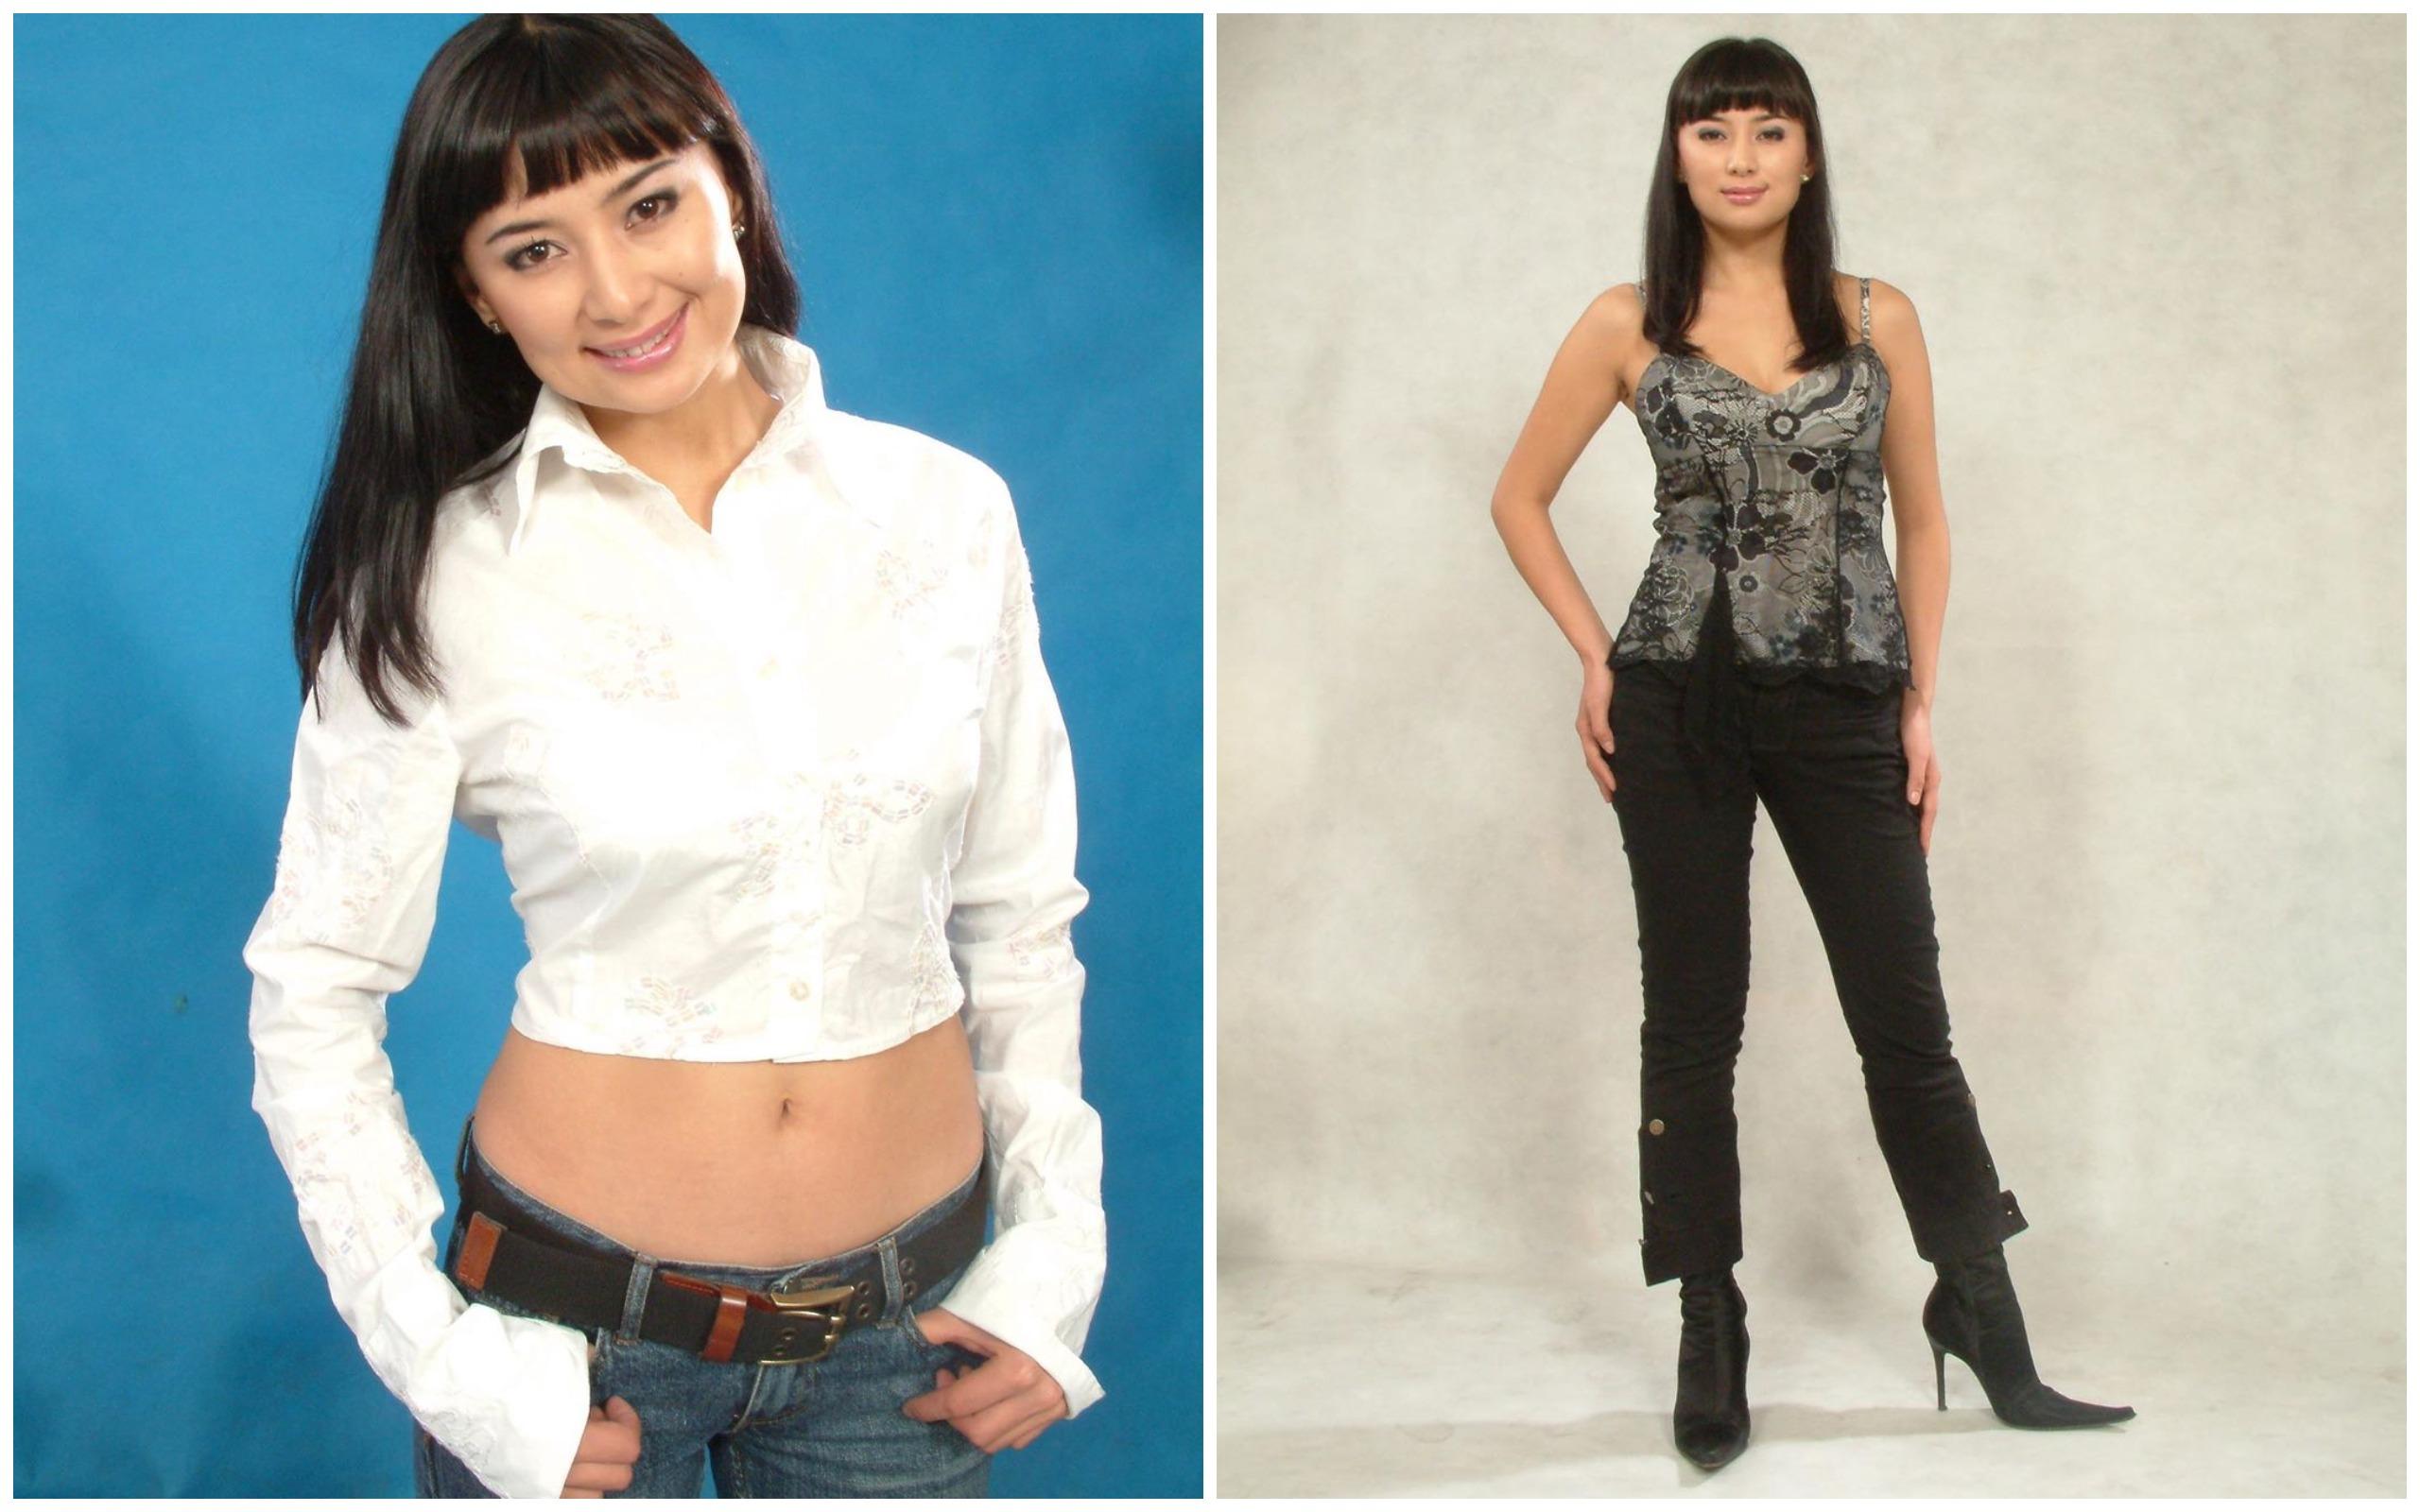 e00c2f52393a83f787428443b4f2923d - Madina Sadvakasova angry KazNet open abdomen